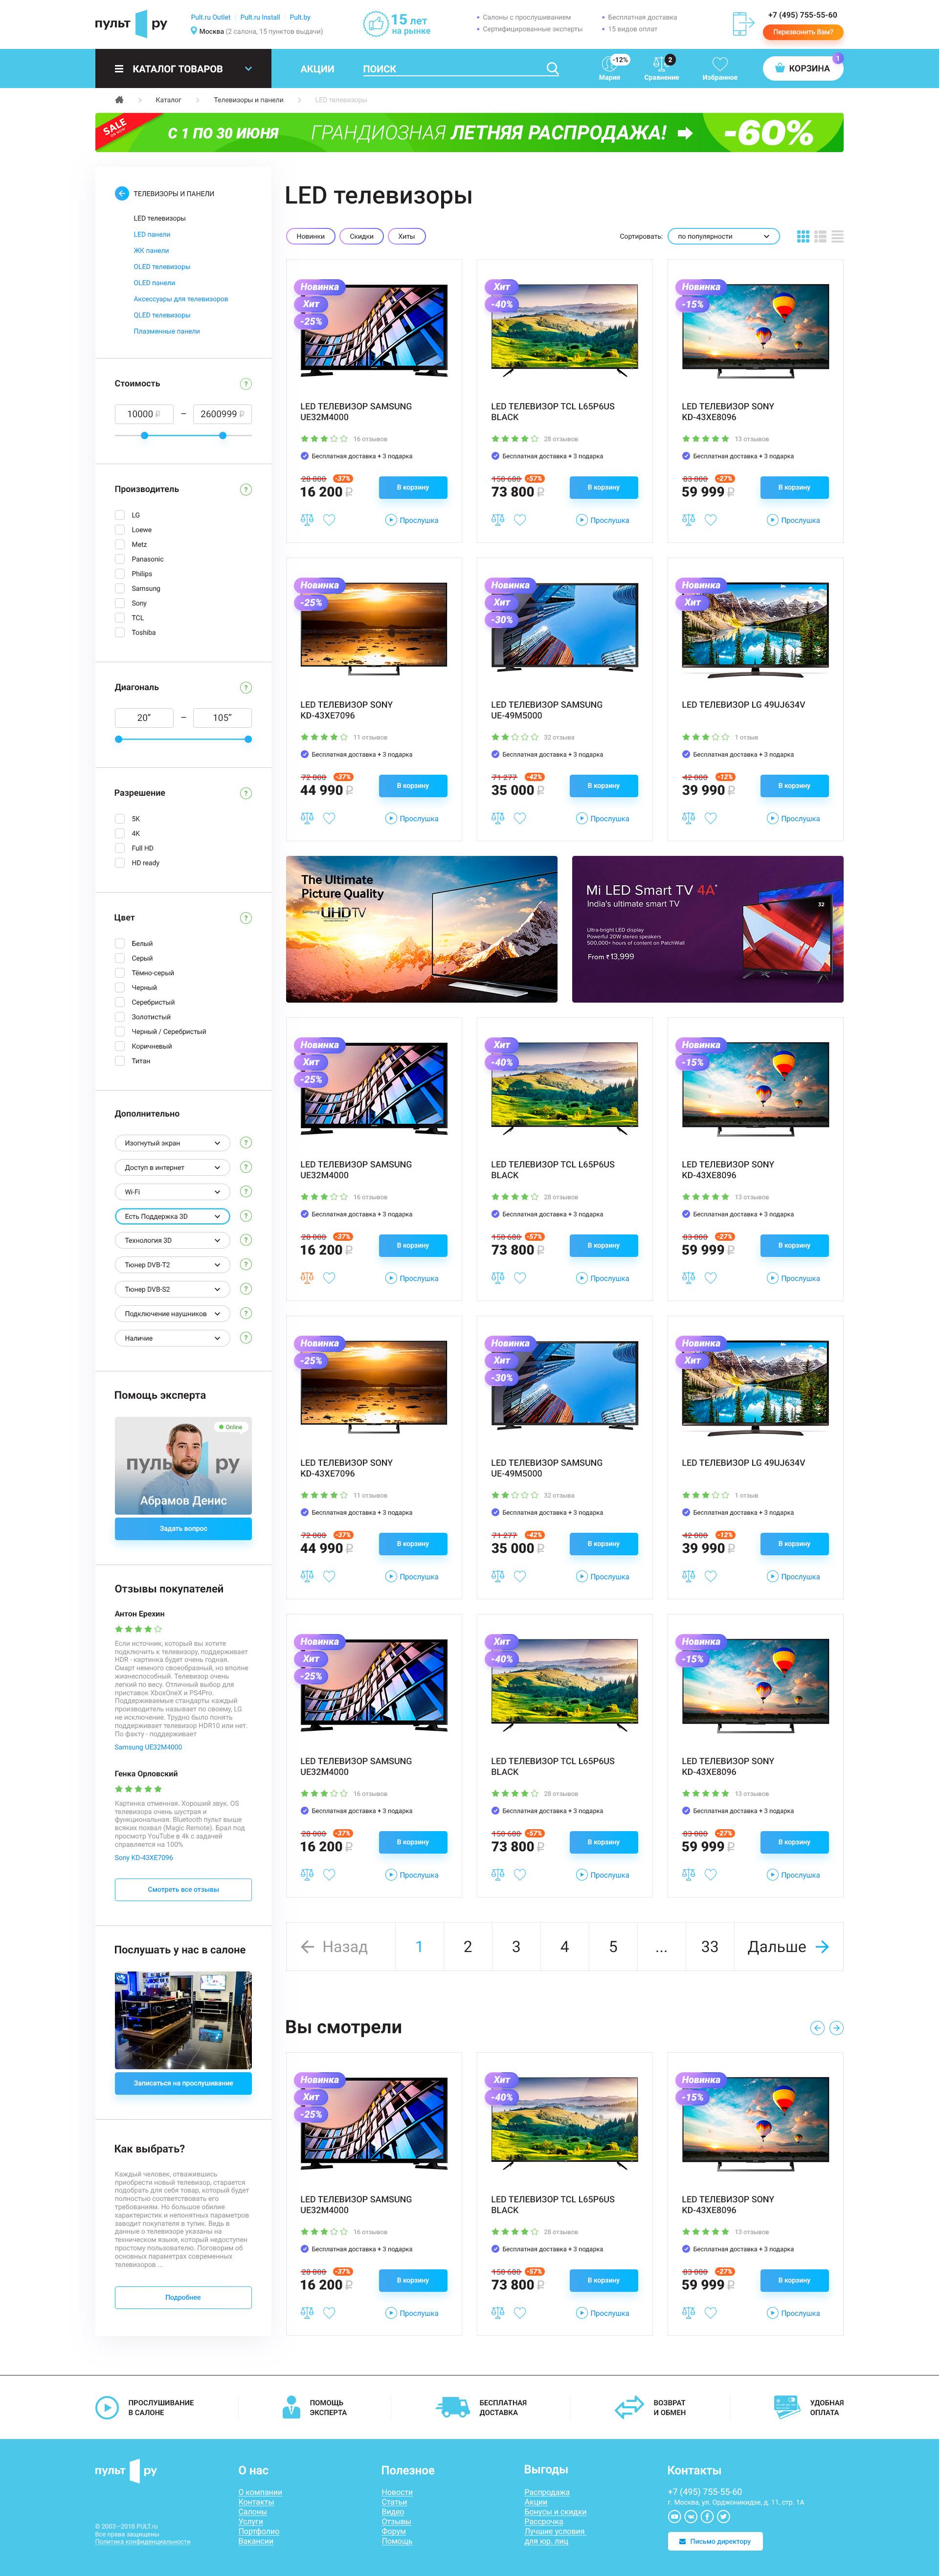 Дизайн 2ух страниц сайта PULT.ru фото f_4085b0cd5a668503.jpg